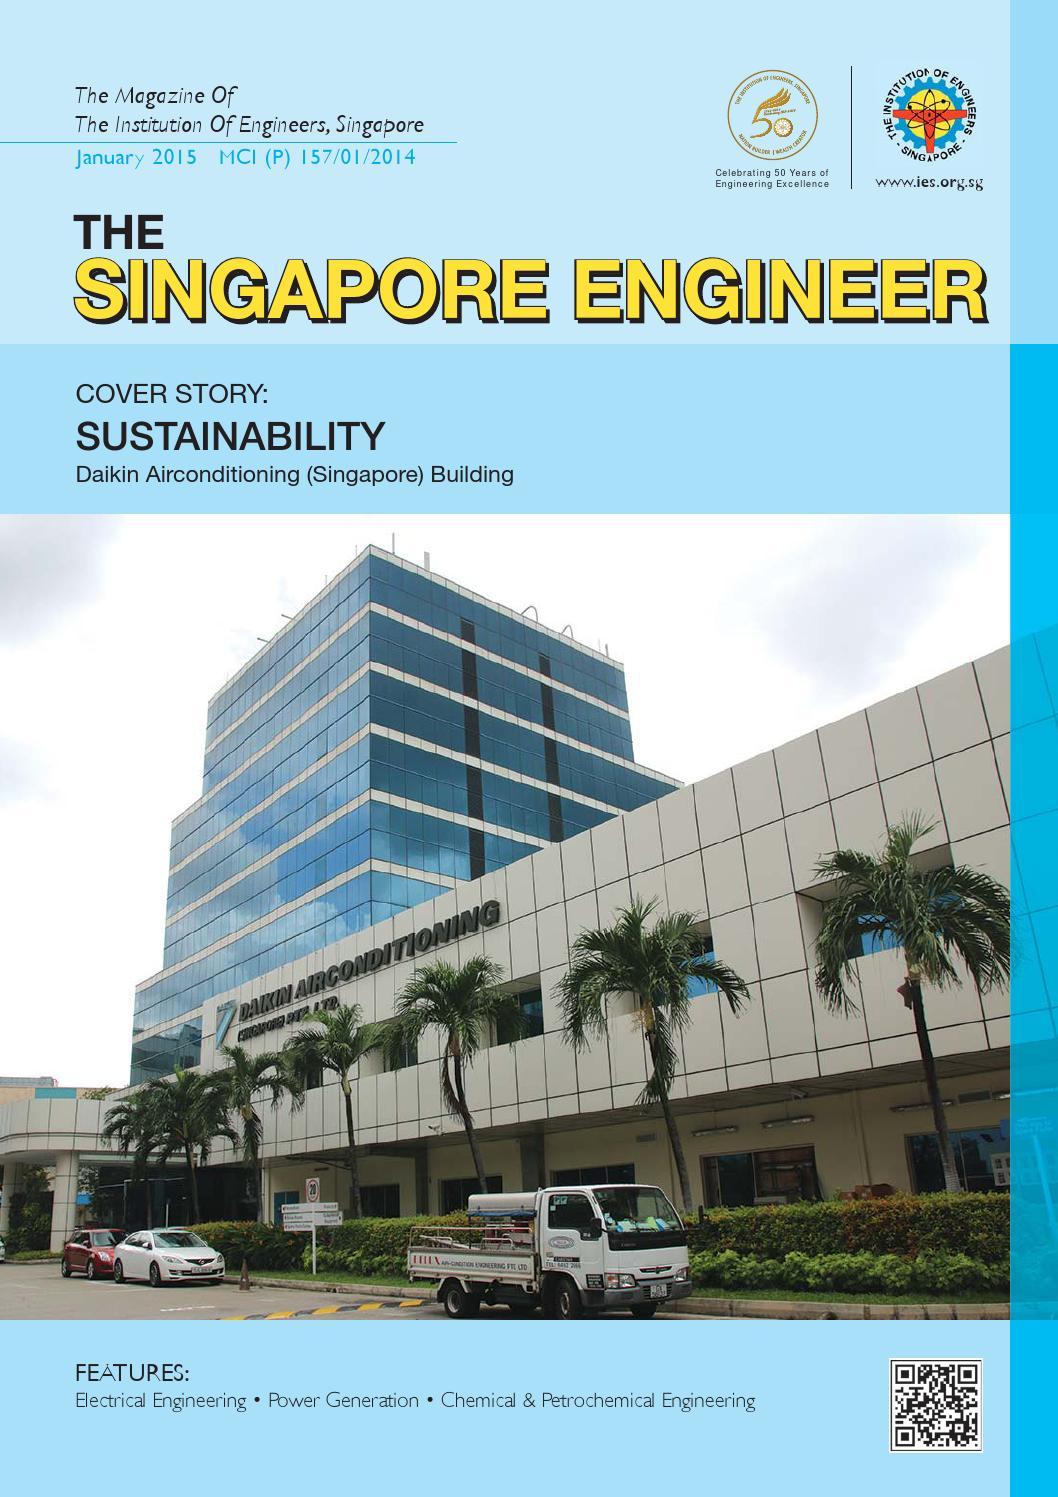 The Singapore Engineer January 2015 by The Singapore Engineer - issuu